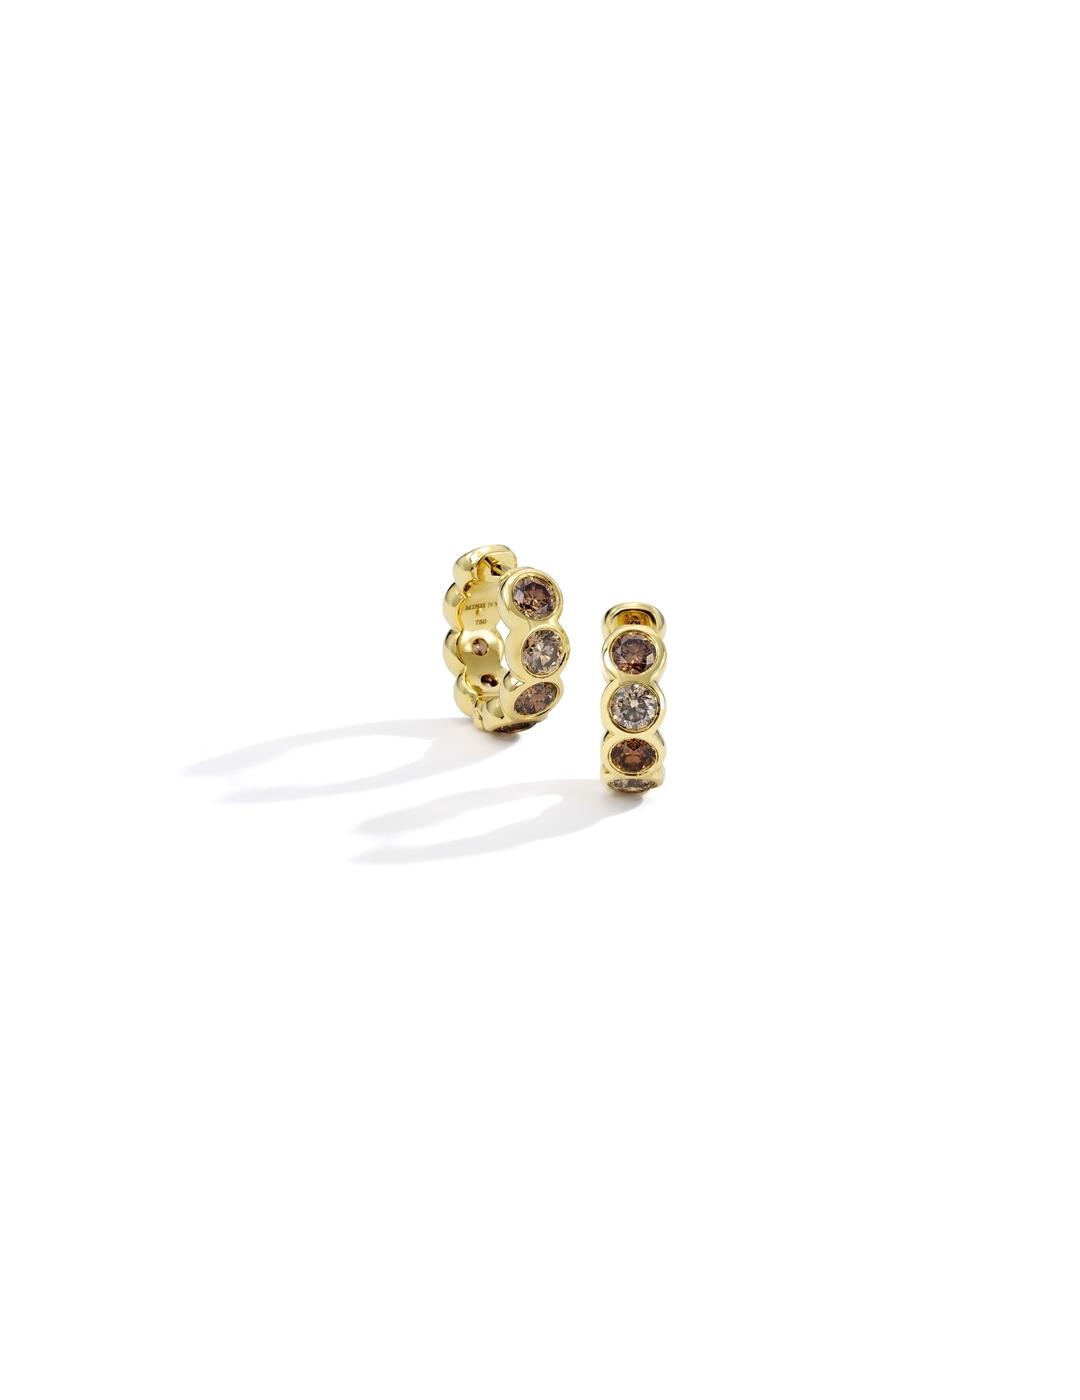 mish_products_earrings_ElizabethHoops-BrwnDiam-1